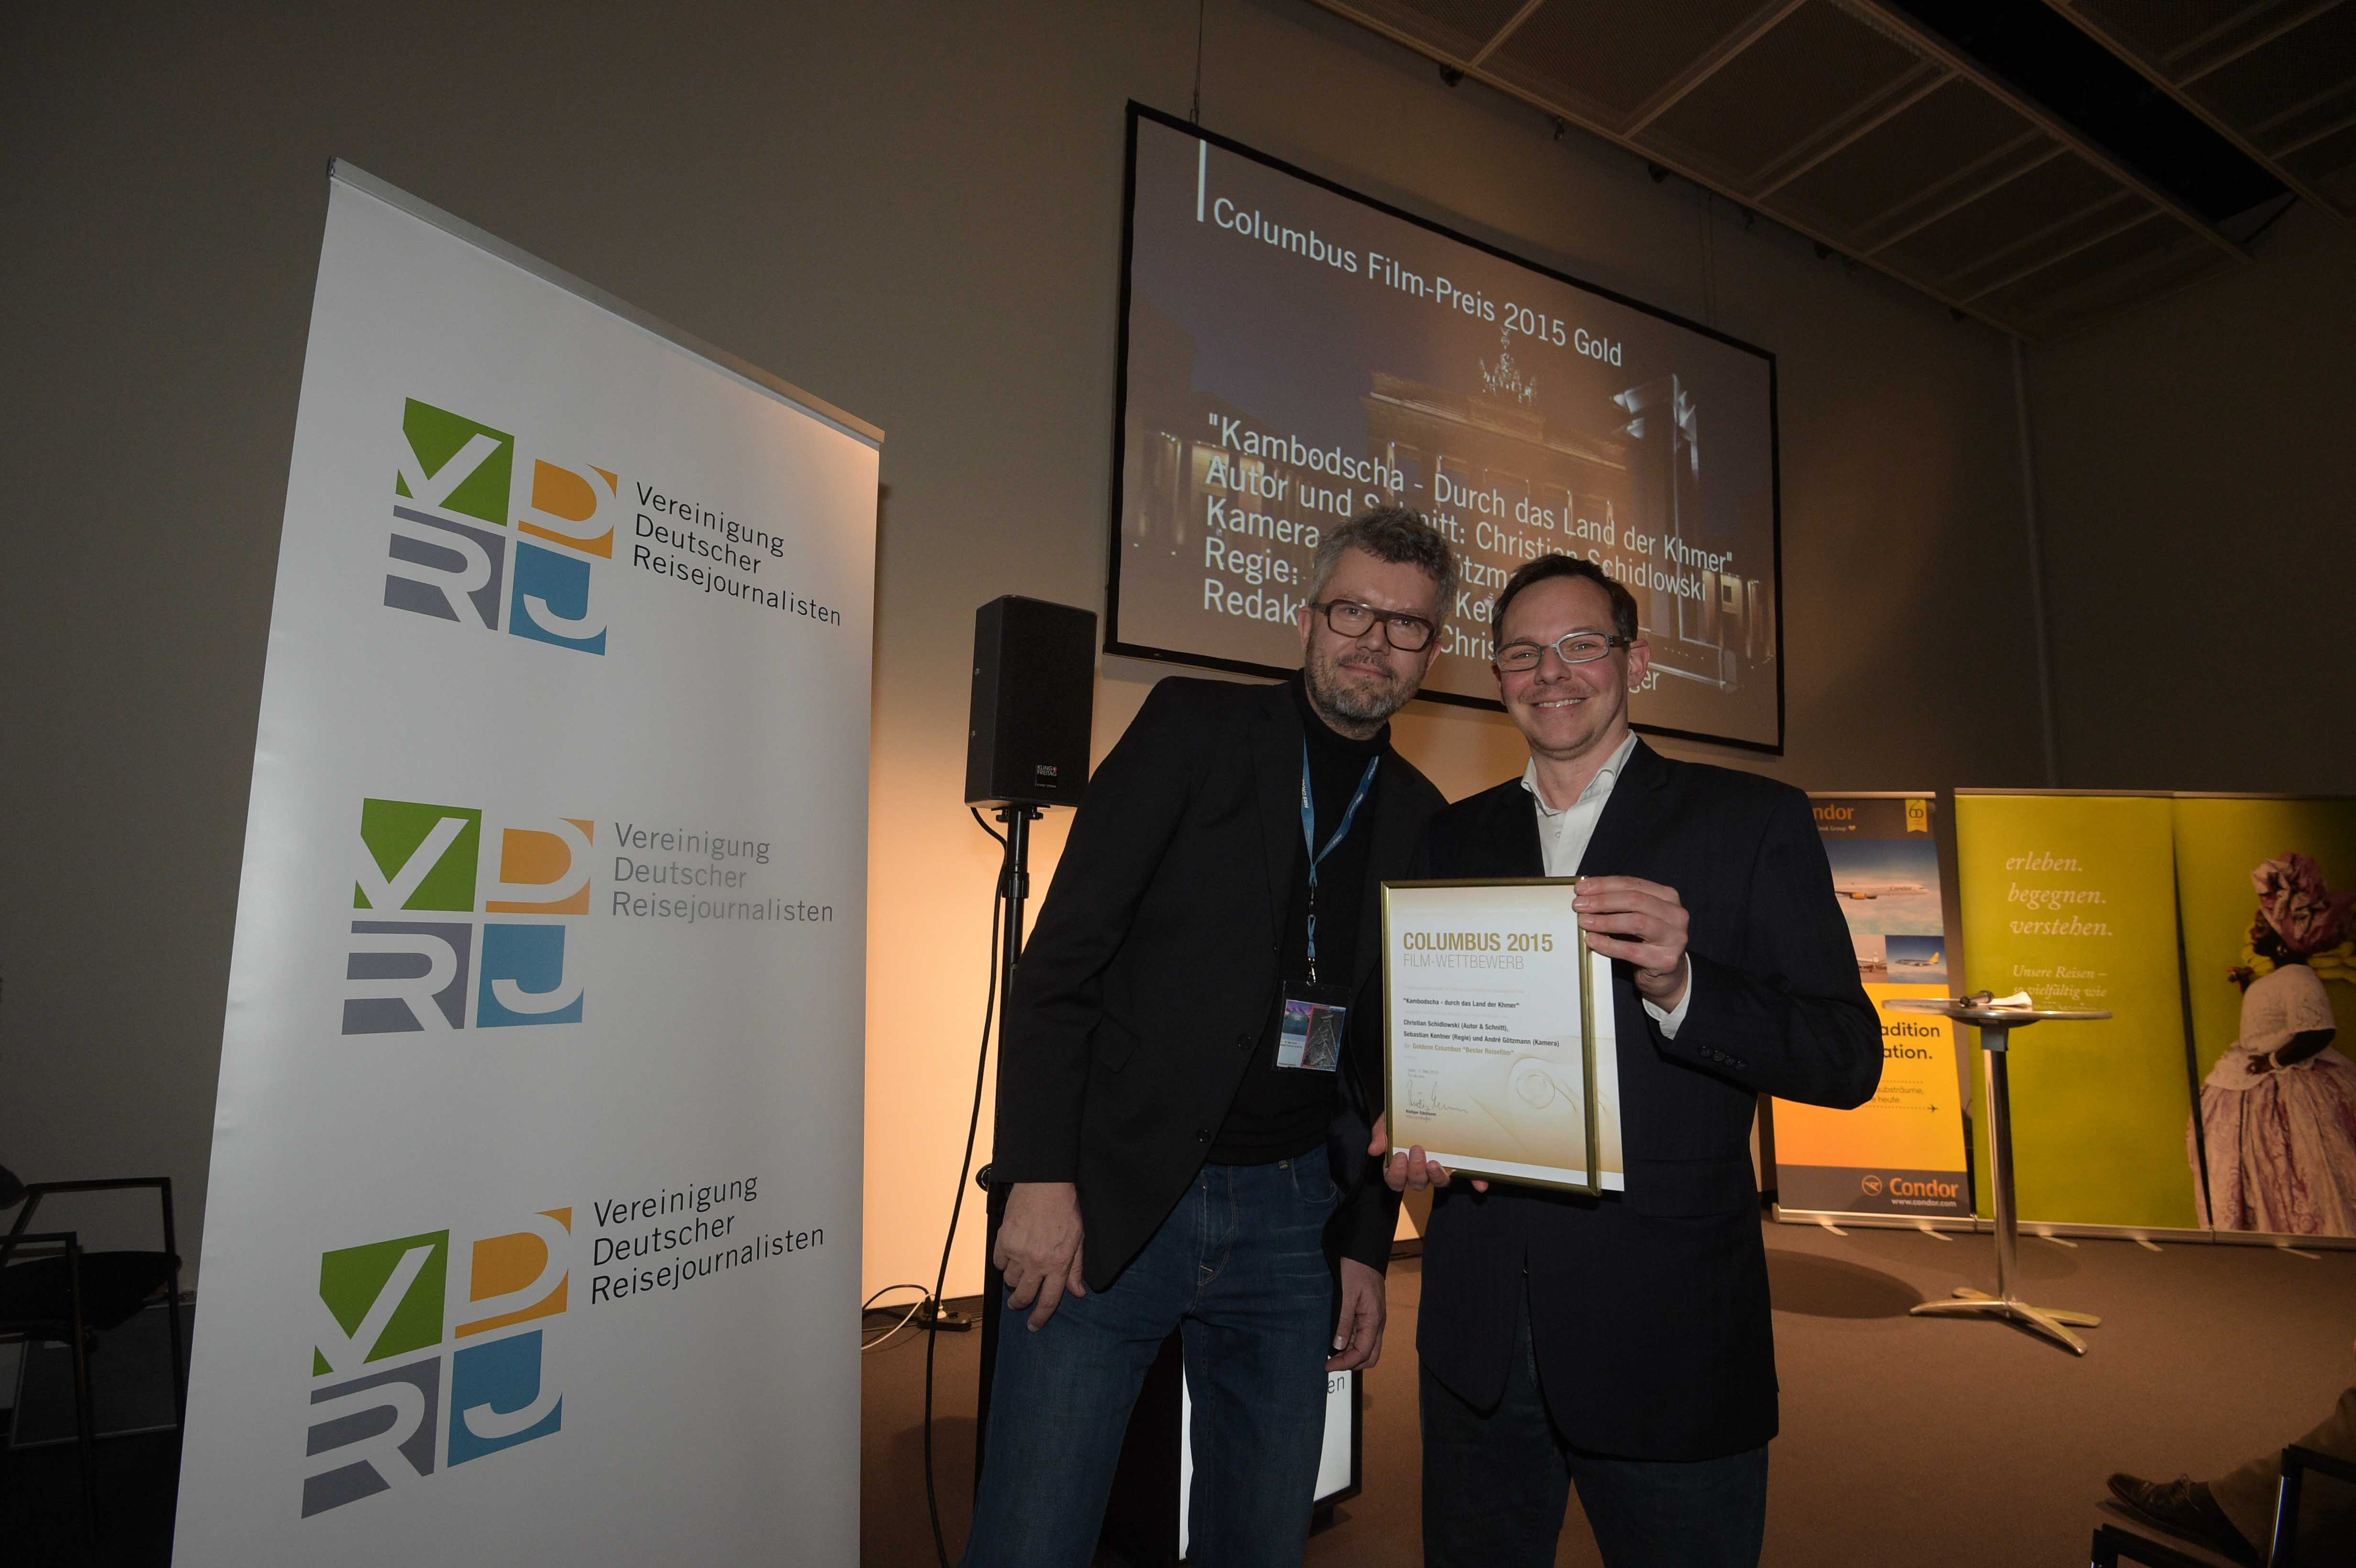 Columbus Film Preisverleihung 2015 Gold Christian Schidlowski ZDF Arte Thomas Radler web